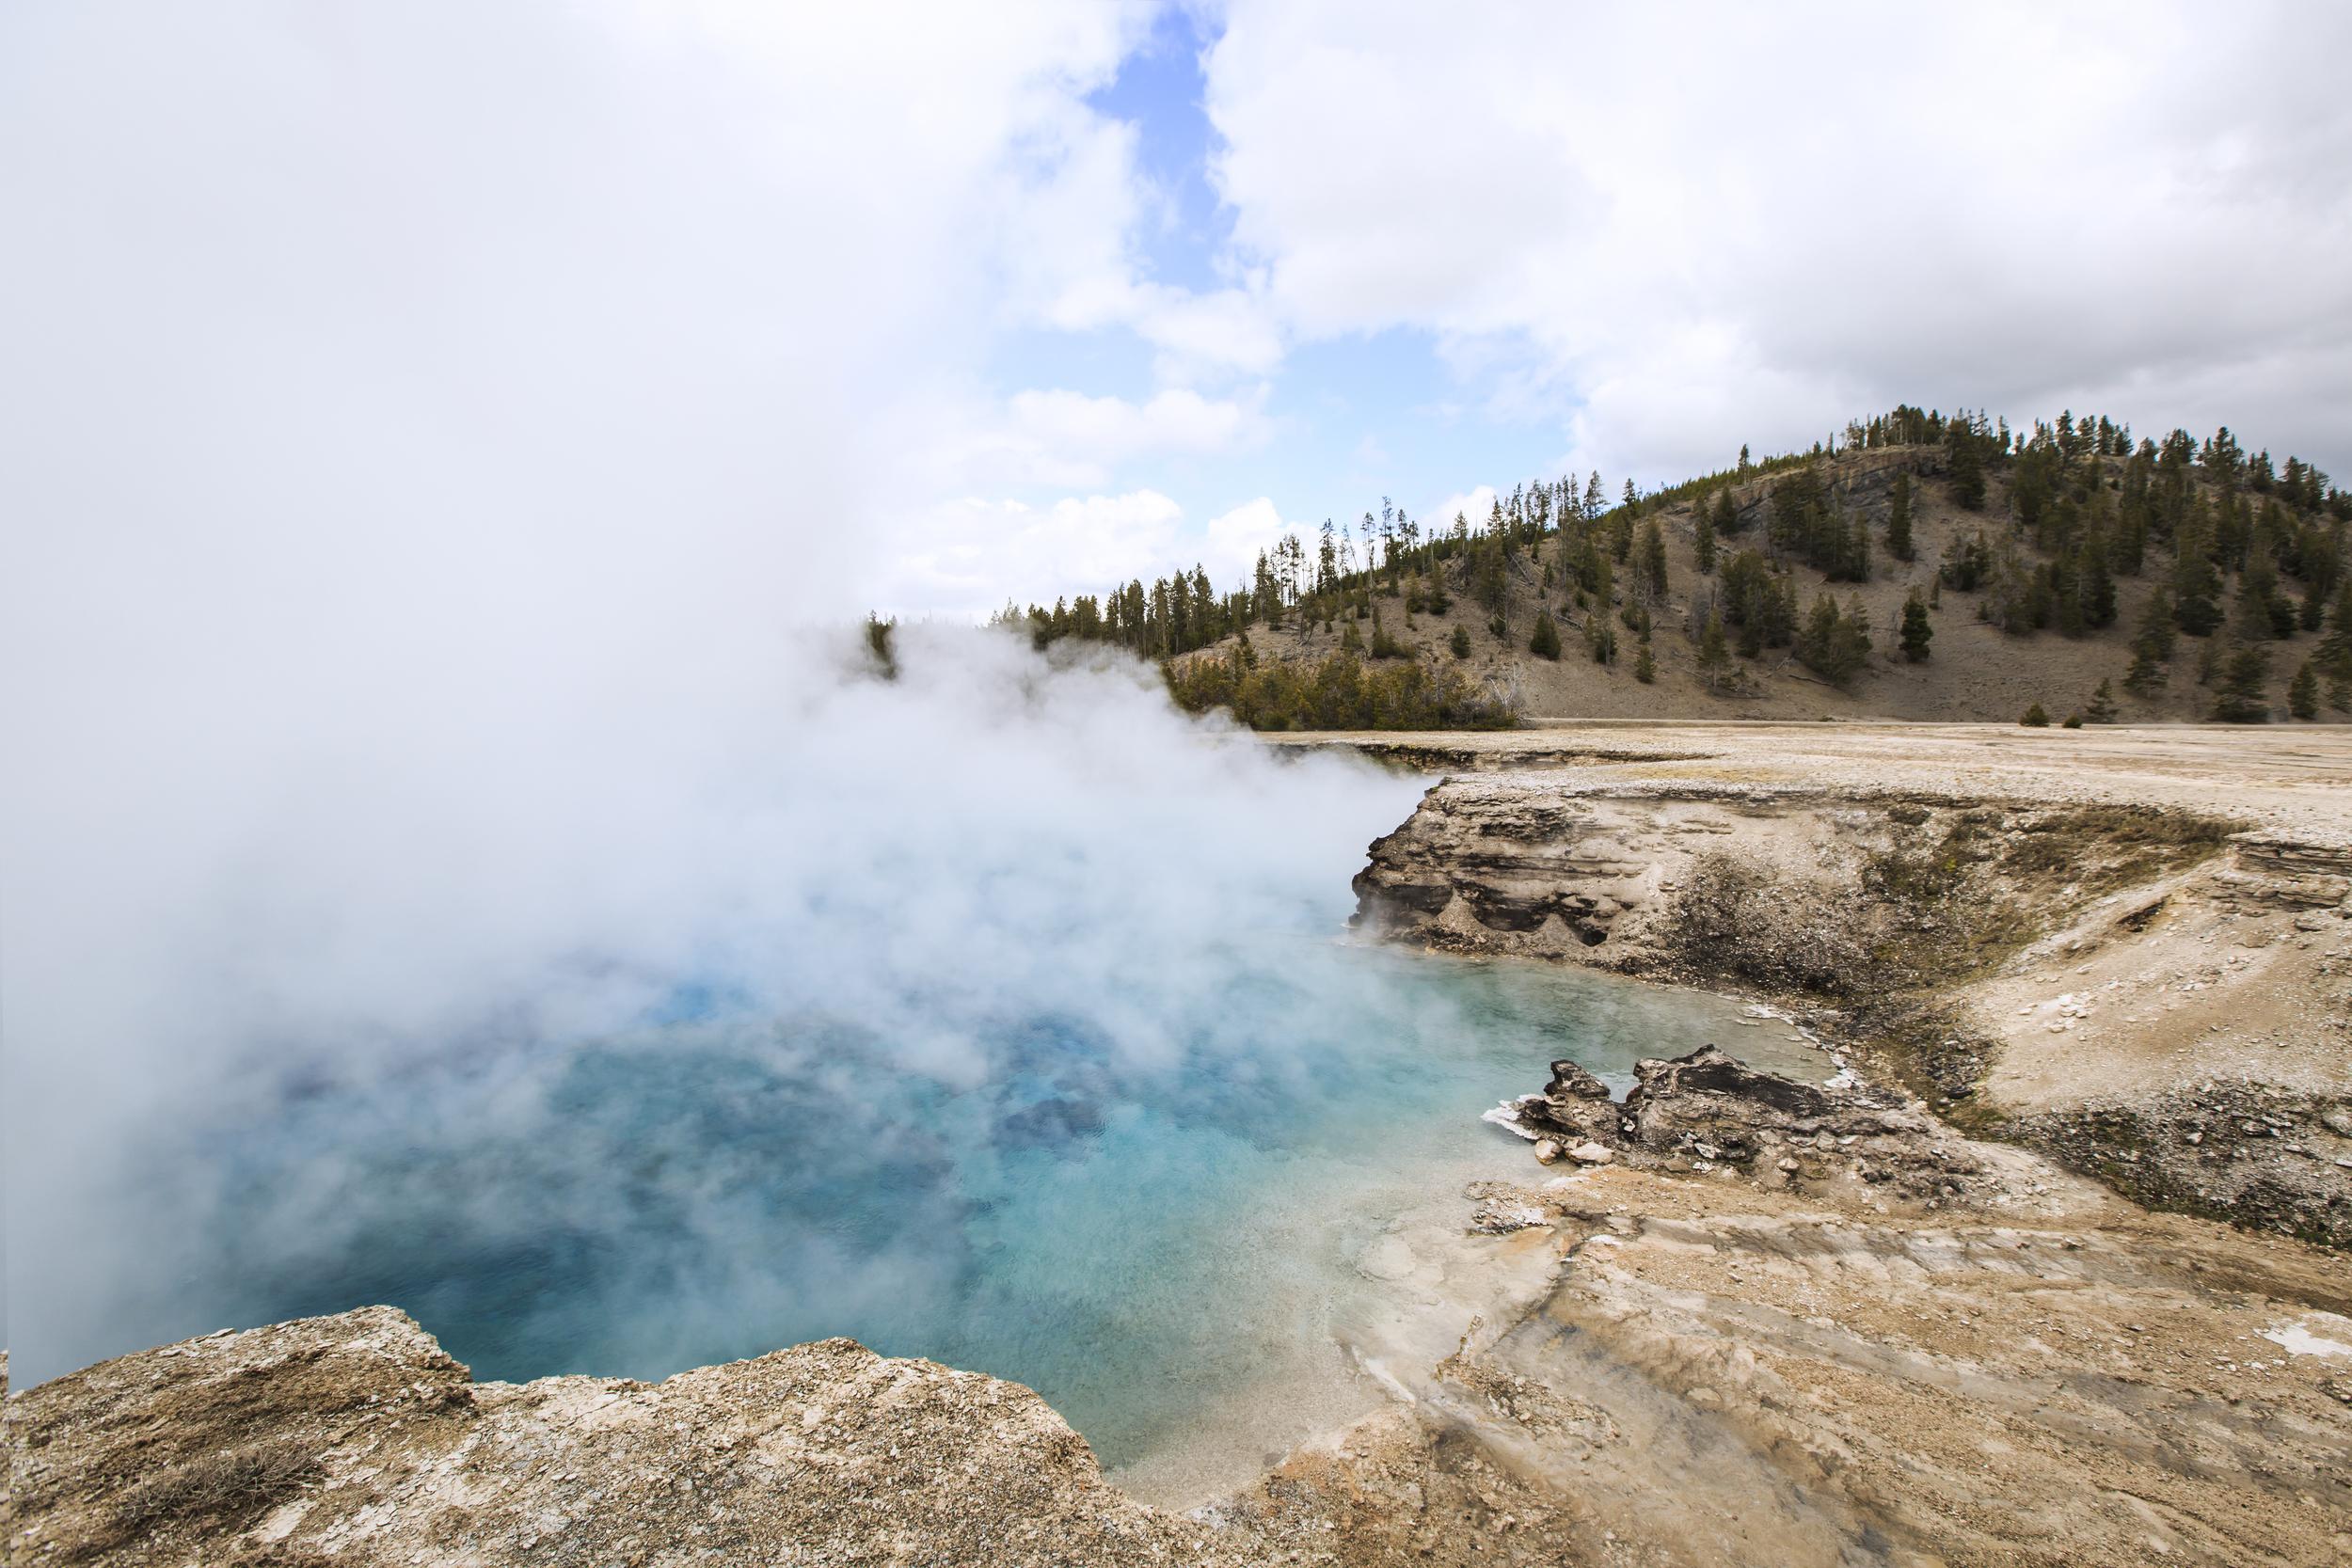 Hot Springs: Landrover